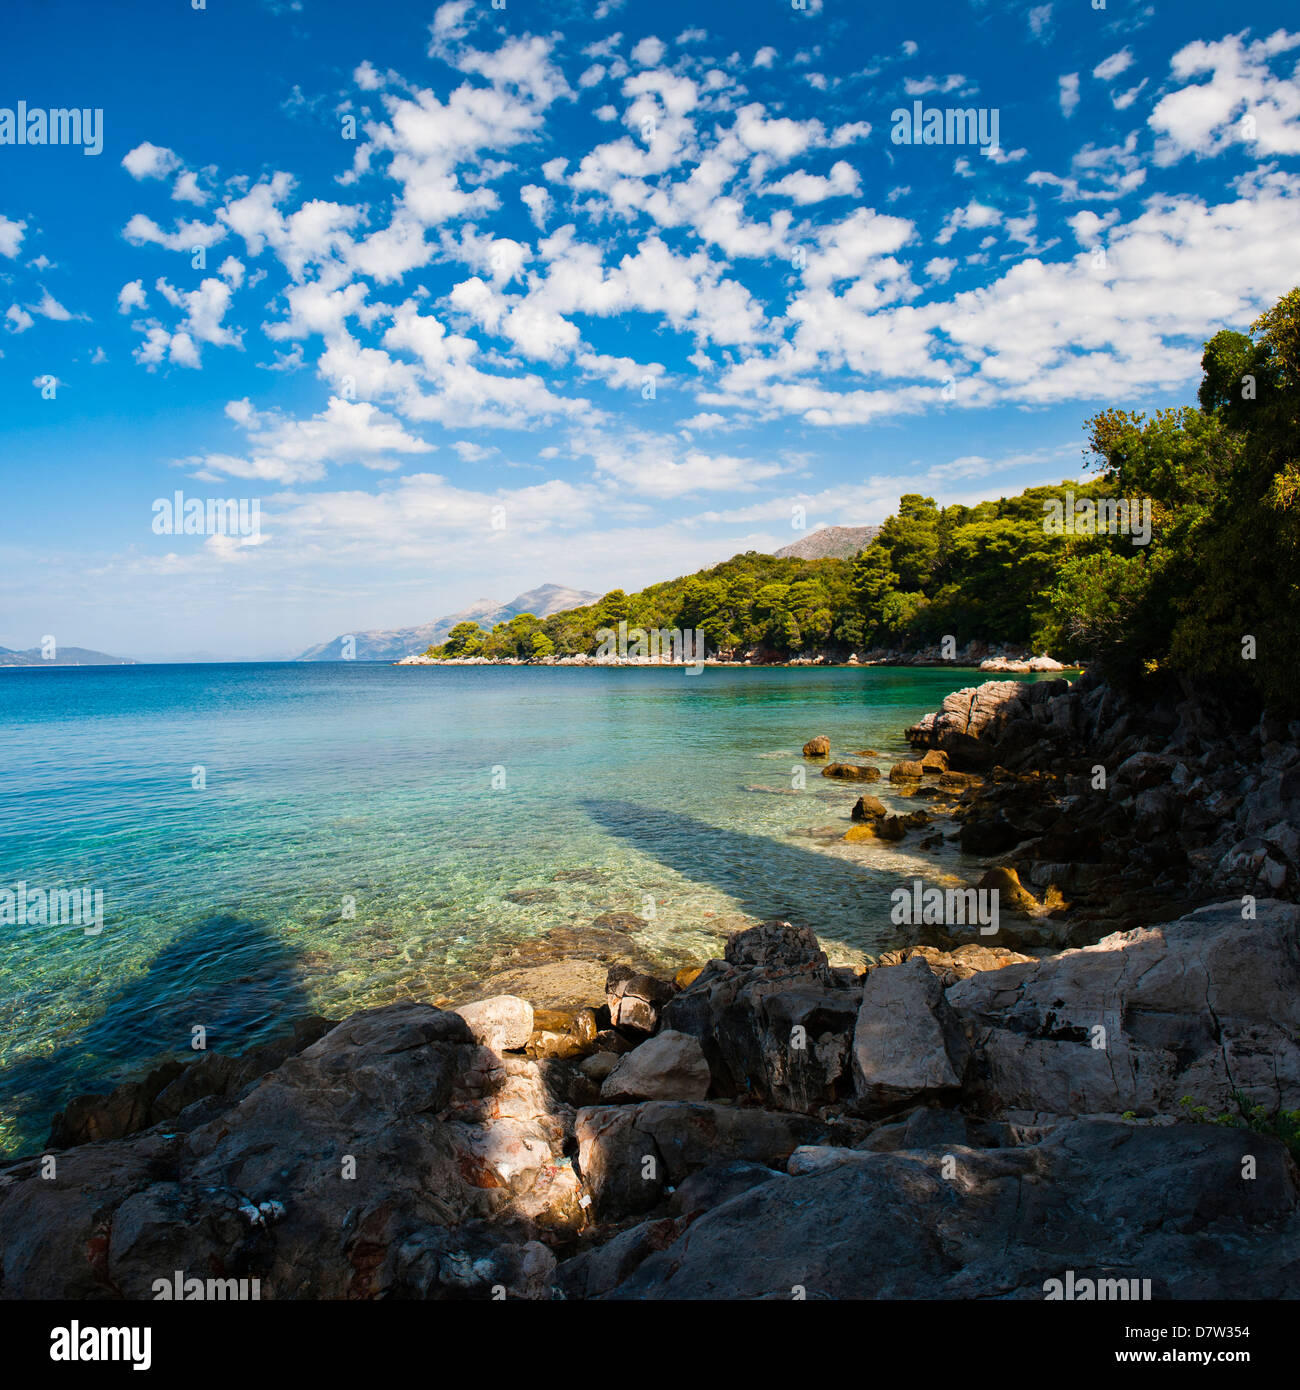 Kolocep Island (Kalamota), Elaphiti Islands (Elaphites), Dalmatian Coast, Adriatic Sea, Croatia - Stock Image